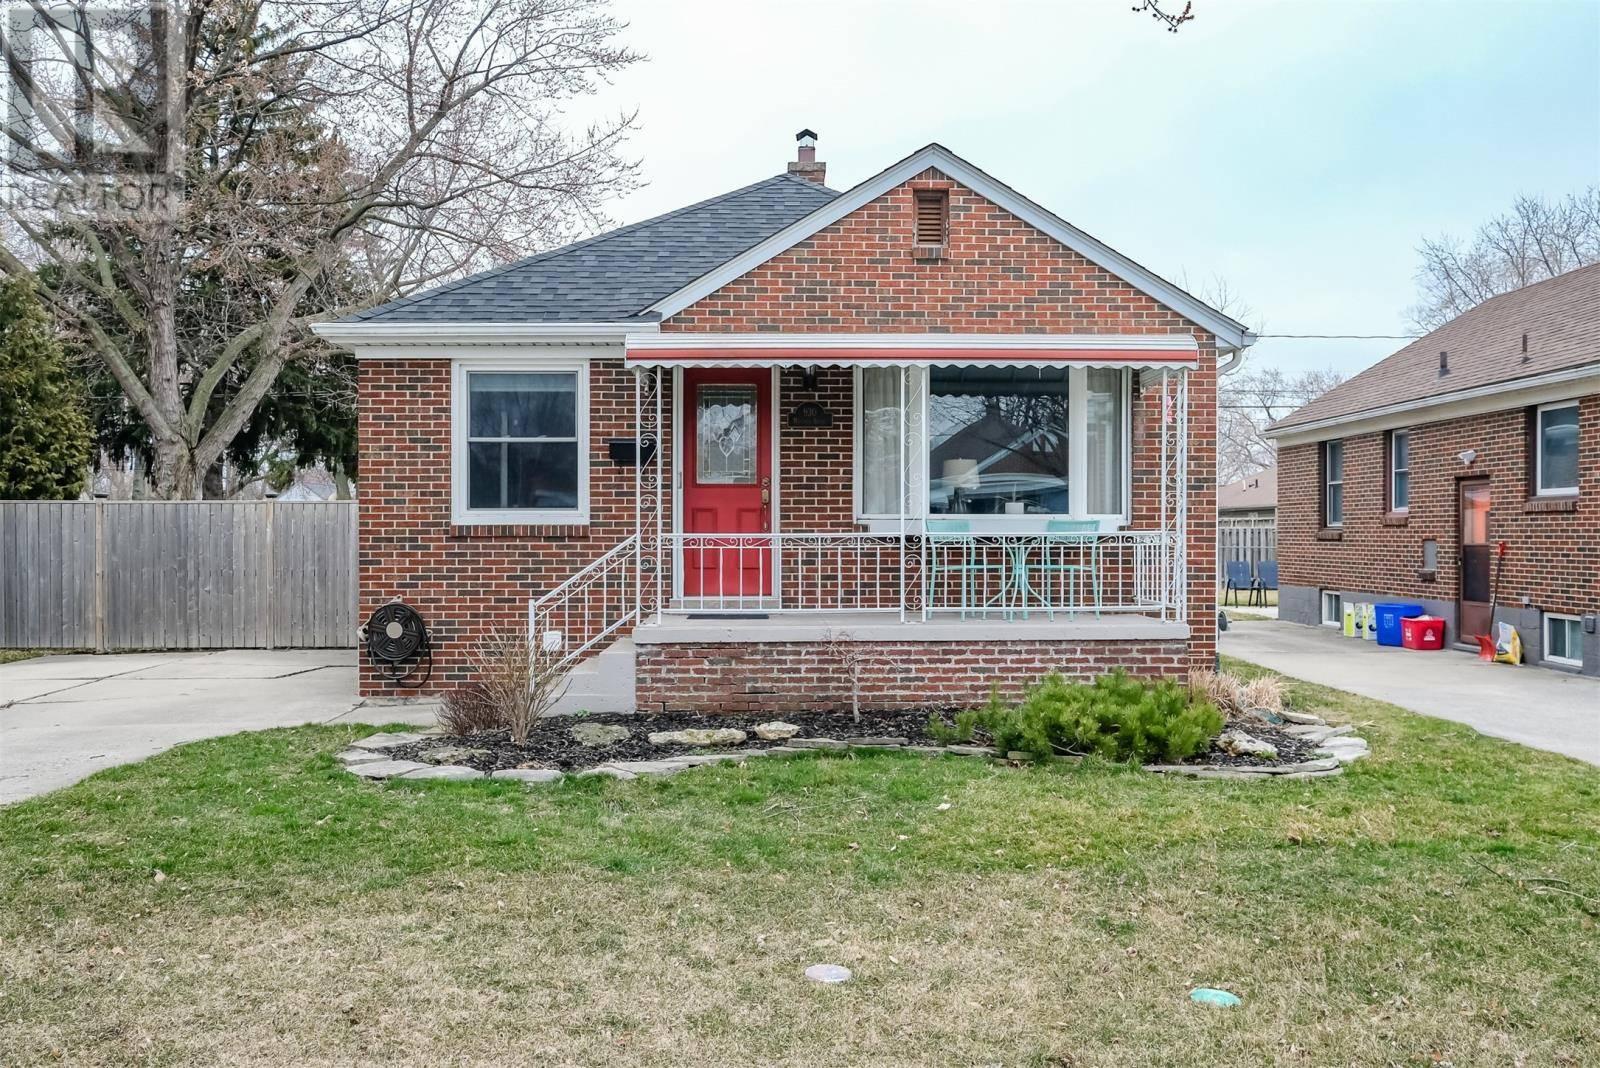 House for sale at 930 Matthew Brady  Windsor Ontario - MLS: 20003578